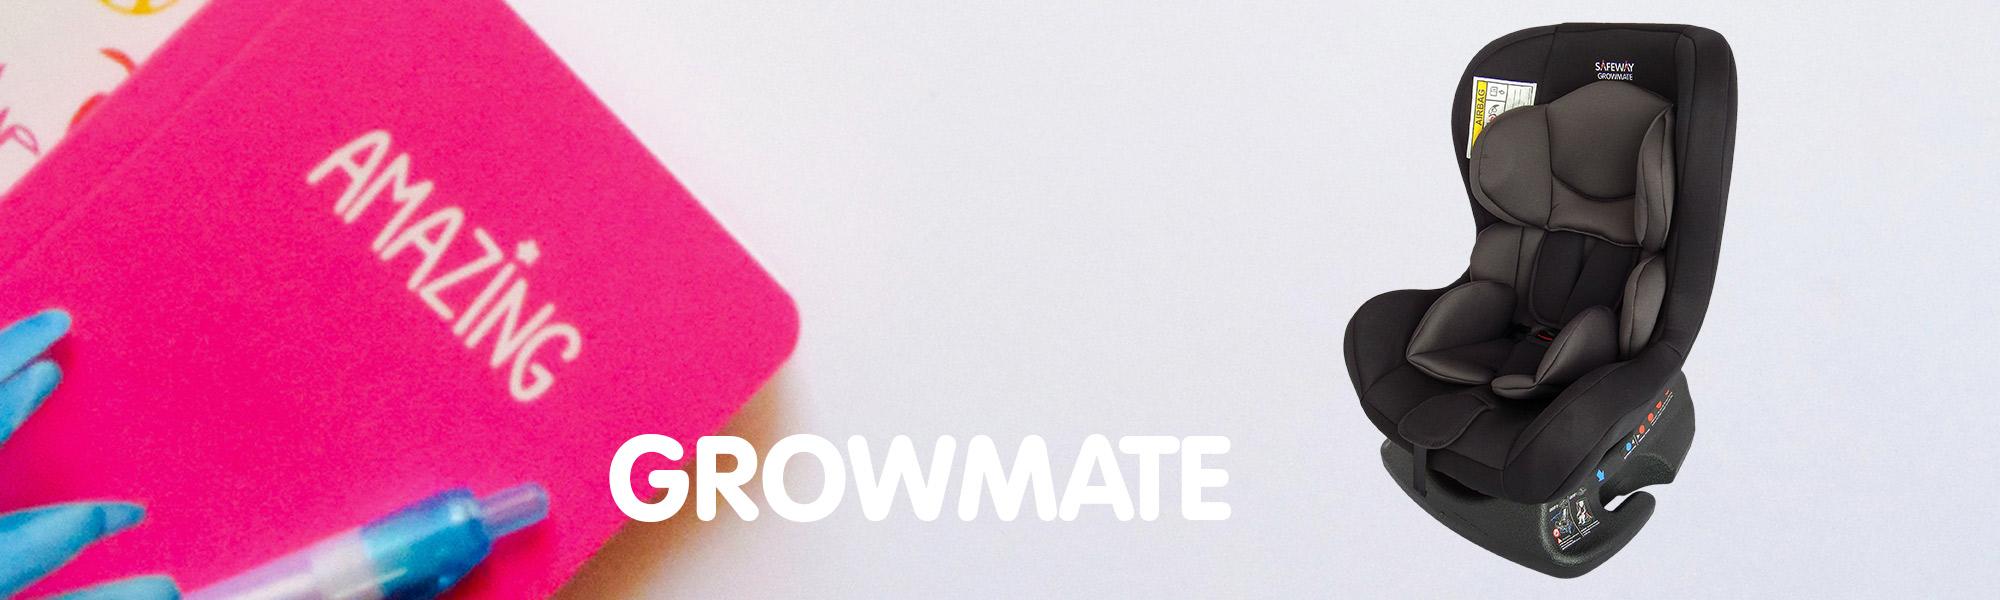 Growmate-2000x600